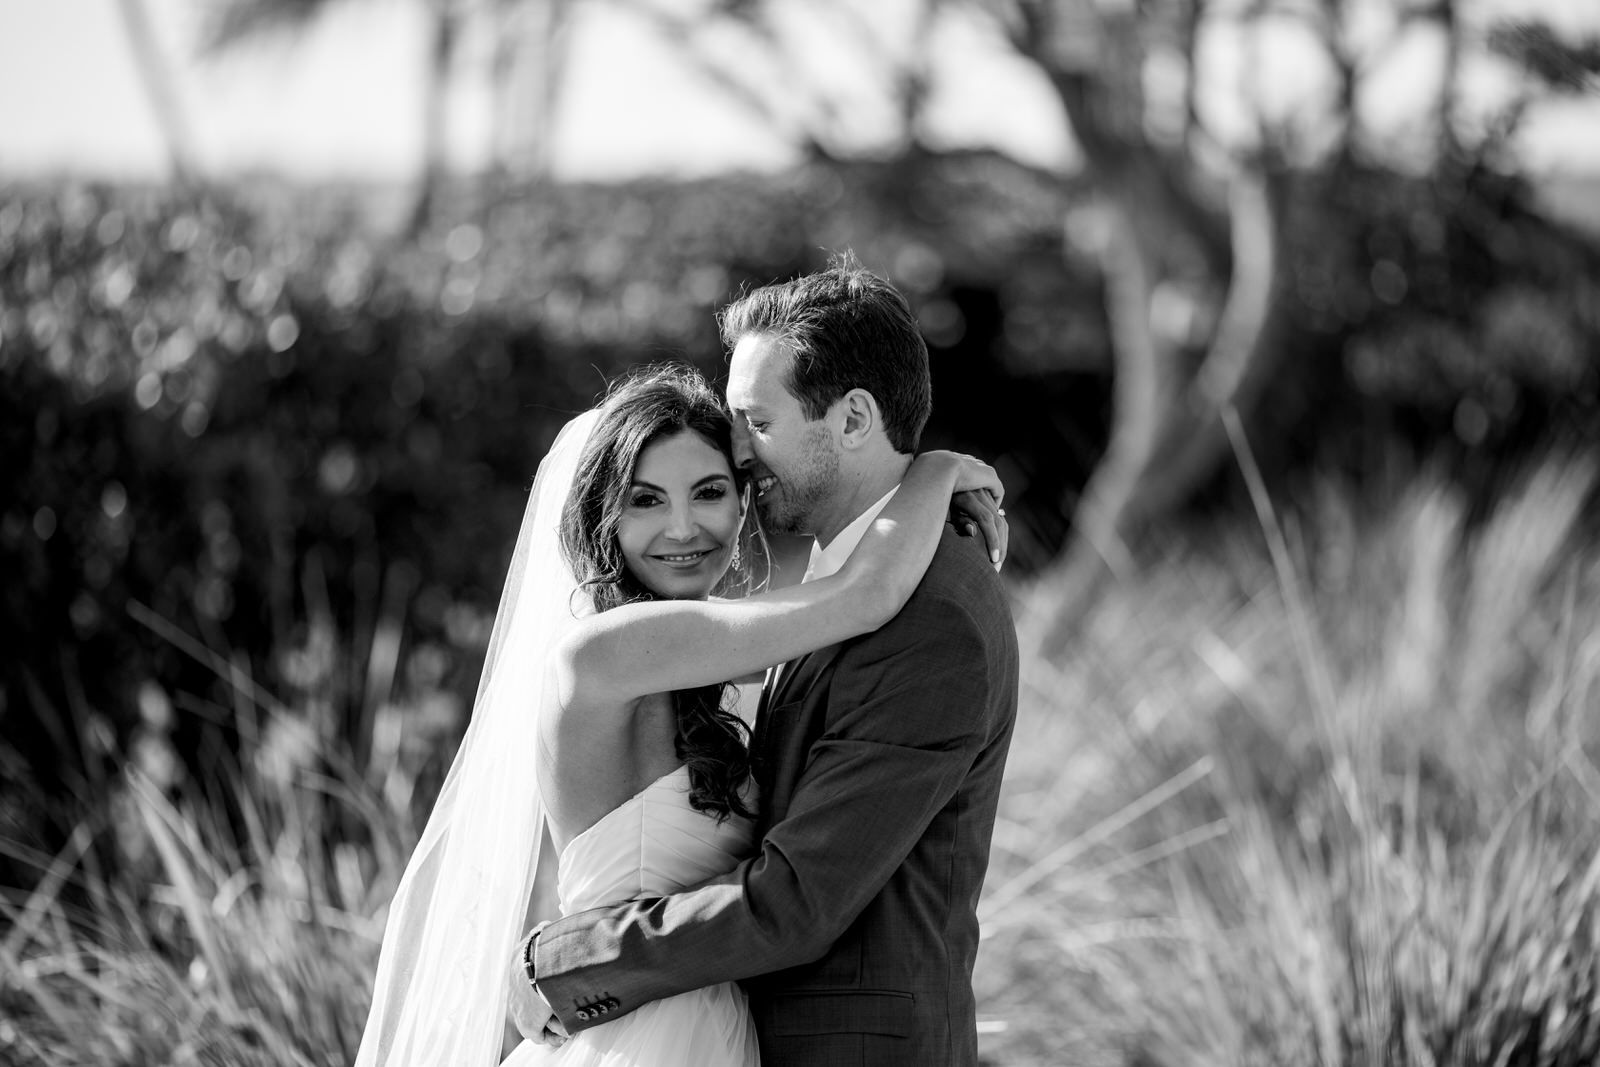 bride_and_groom_jensen_beach_wedding_day-144.jpg